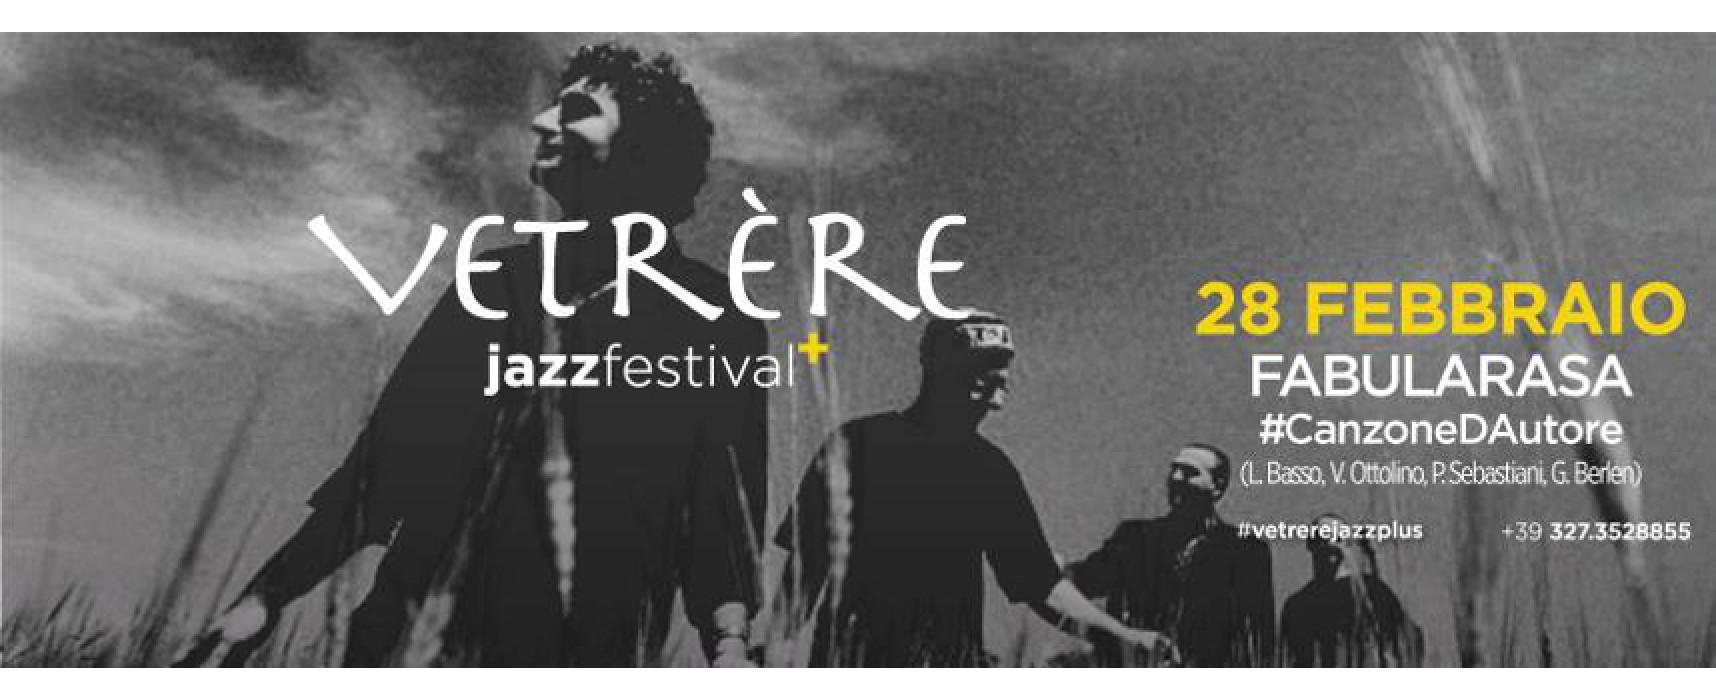 "Al Vetrère Jazz Festival plus il primo disco dei Fabularasa: ""En plein air"""